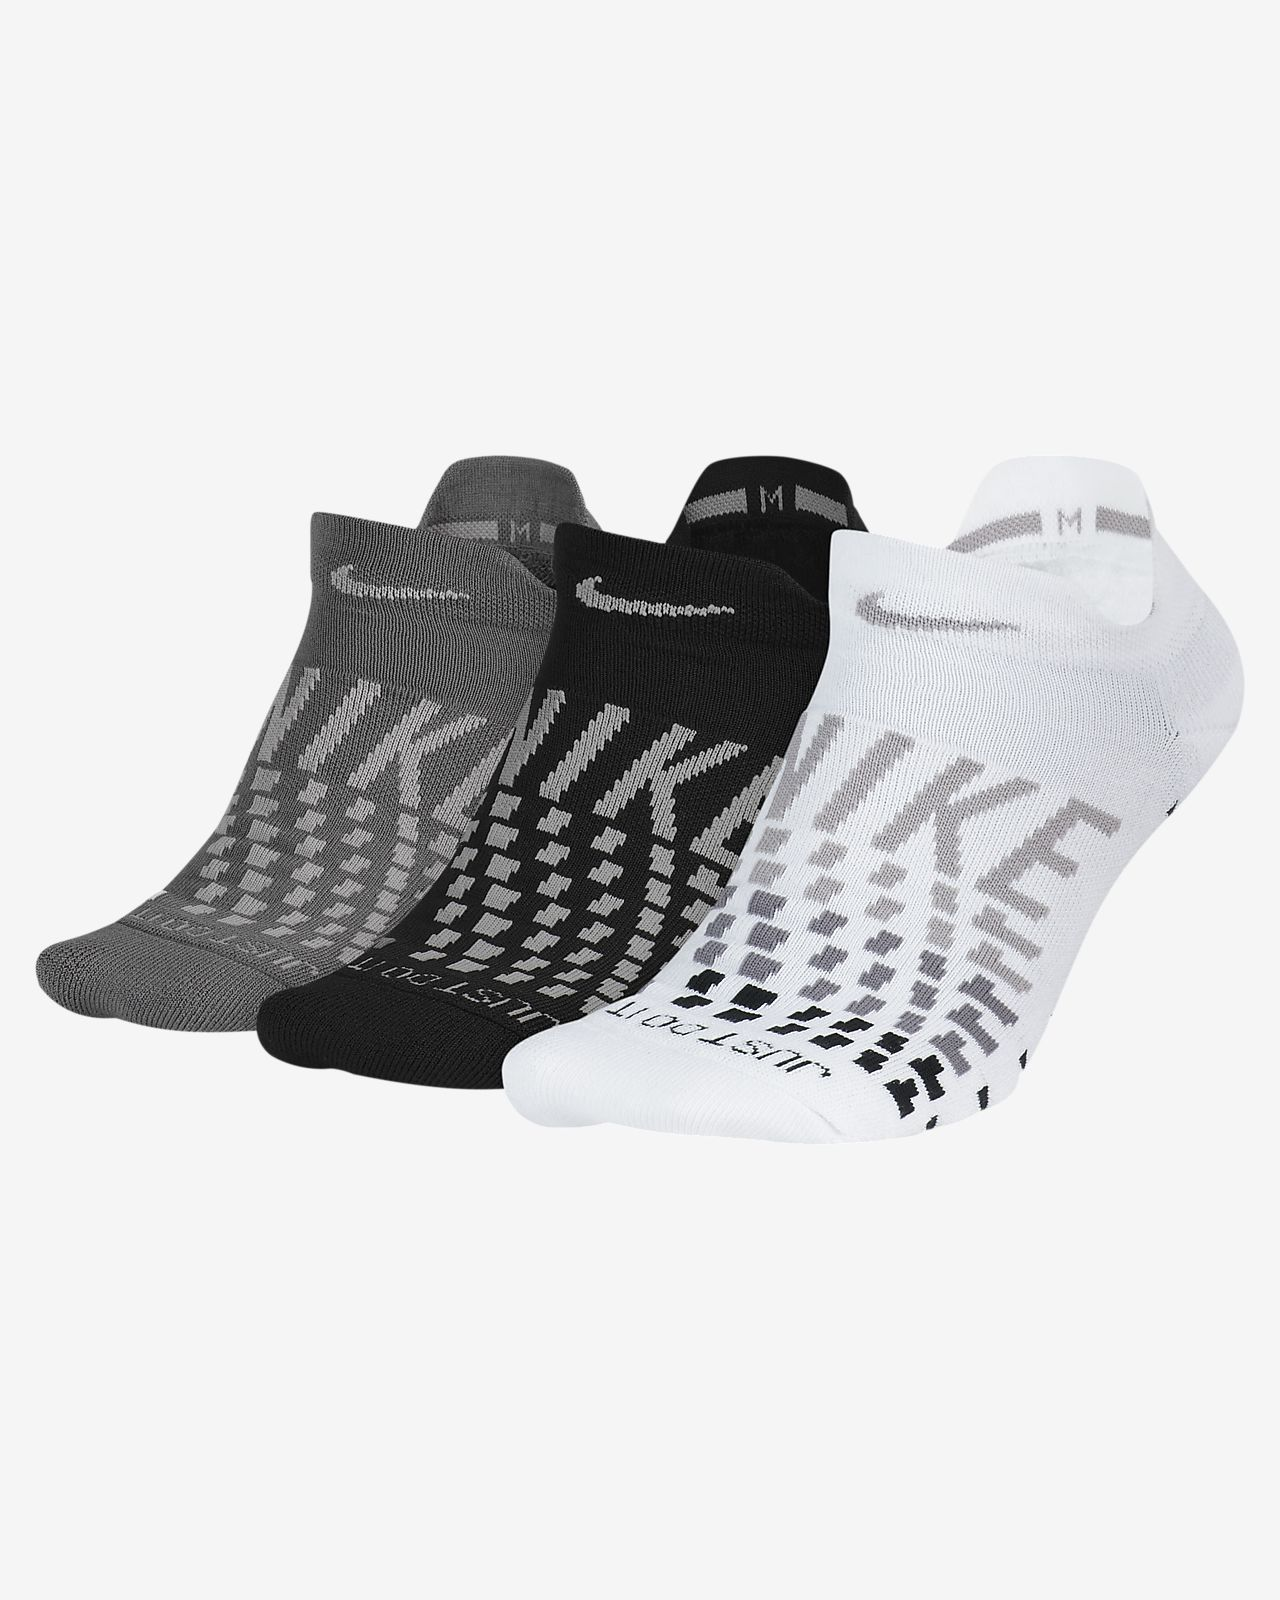 Clothing, Shoes & Accessories Nike Jordan 14 Crew Jumpman Basketball Training Gym Socks Special Summer Sale